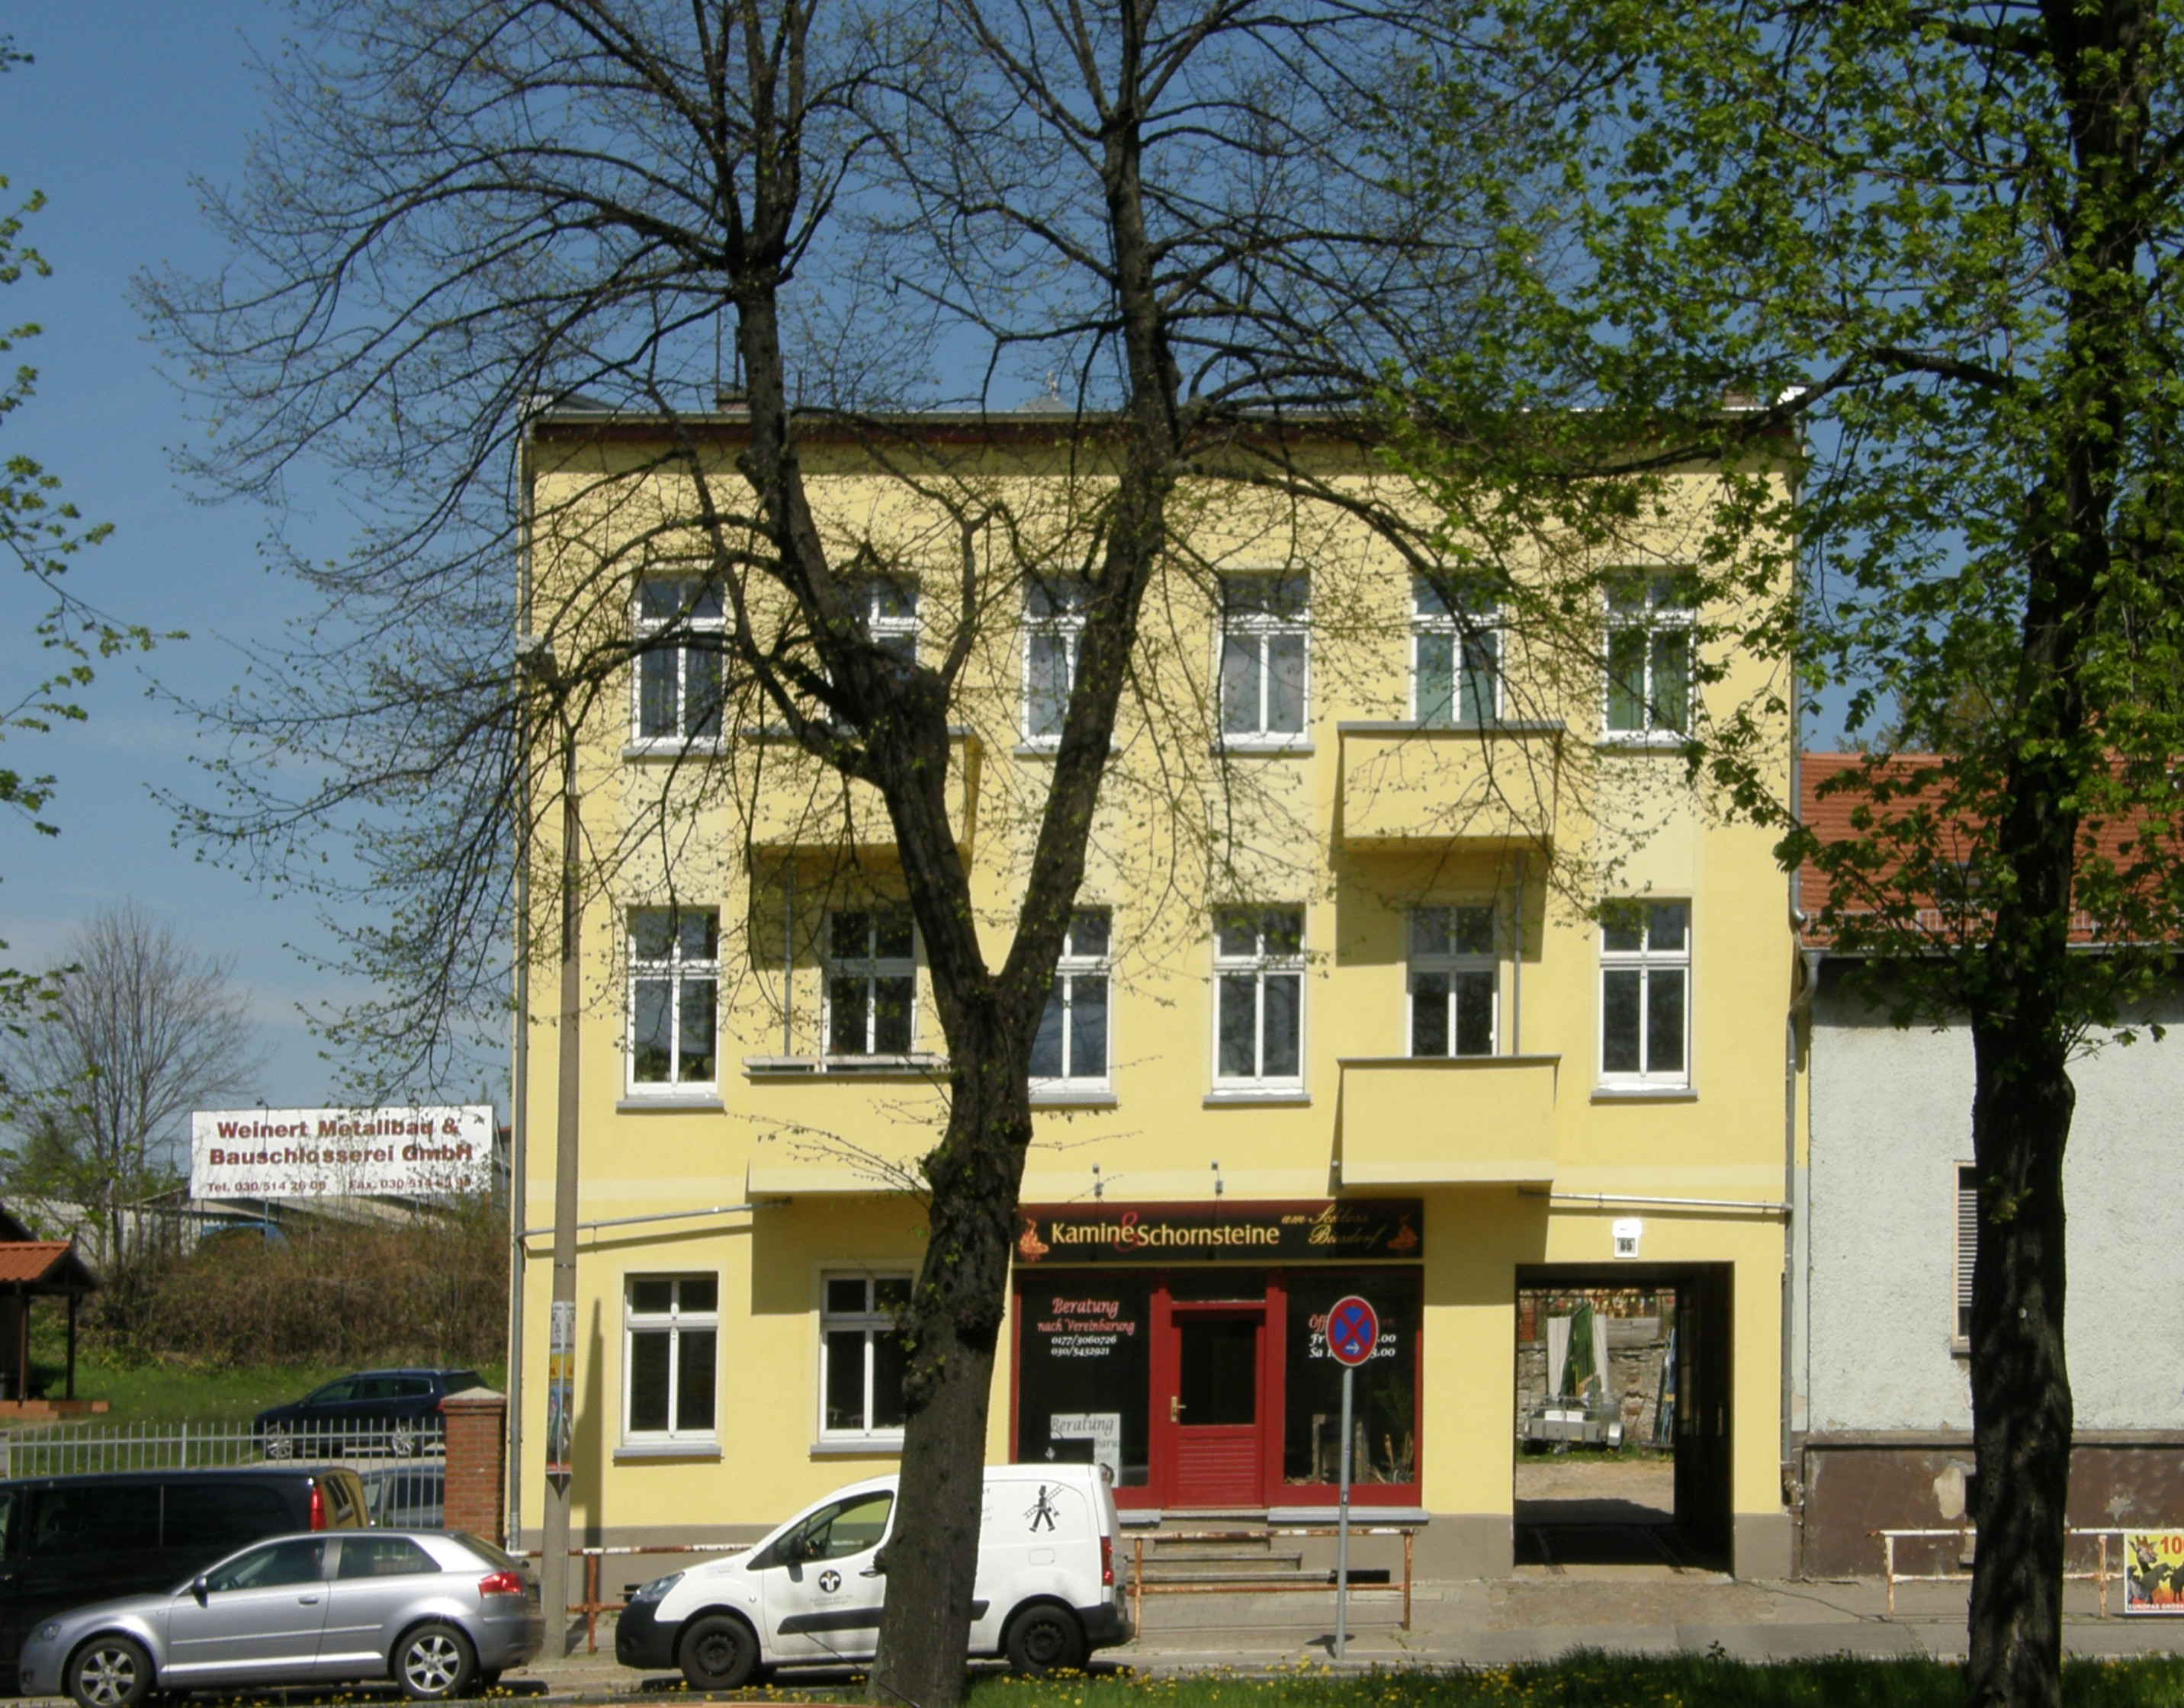 Datei:Alt-Biesdorf 65 2012-4-27 ama fec (1).jpg – Wikipedia